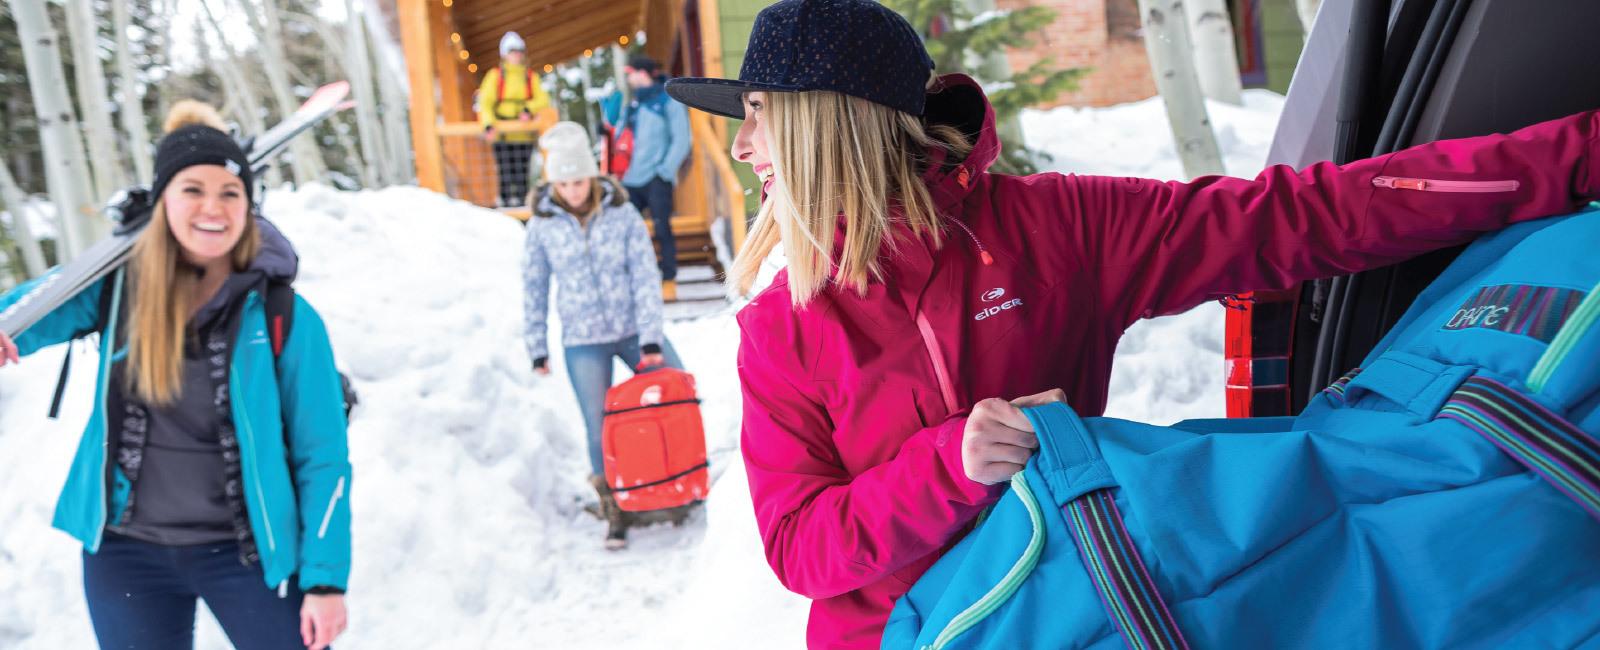 f4c7af0b39 30 Ways to Save on Your Utah Ski Vacation - Ski Utah